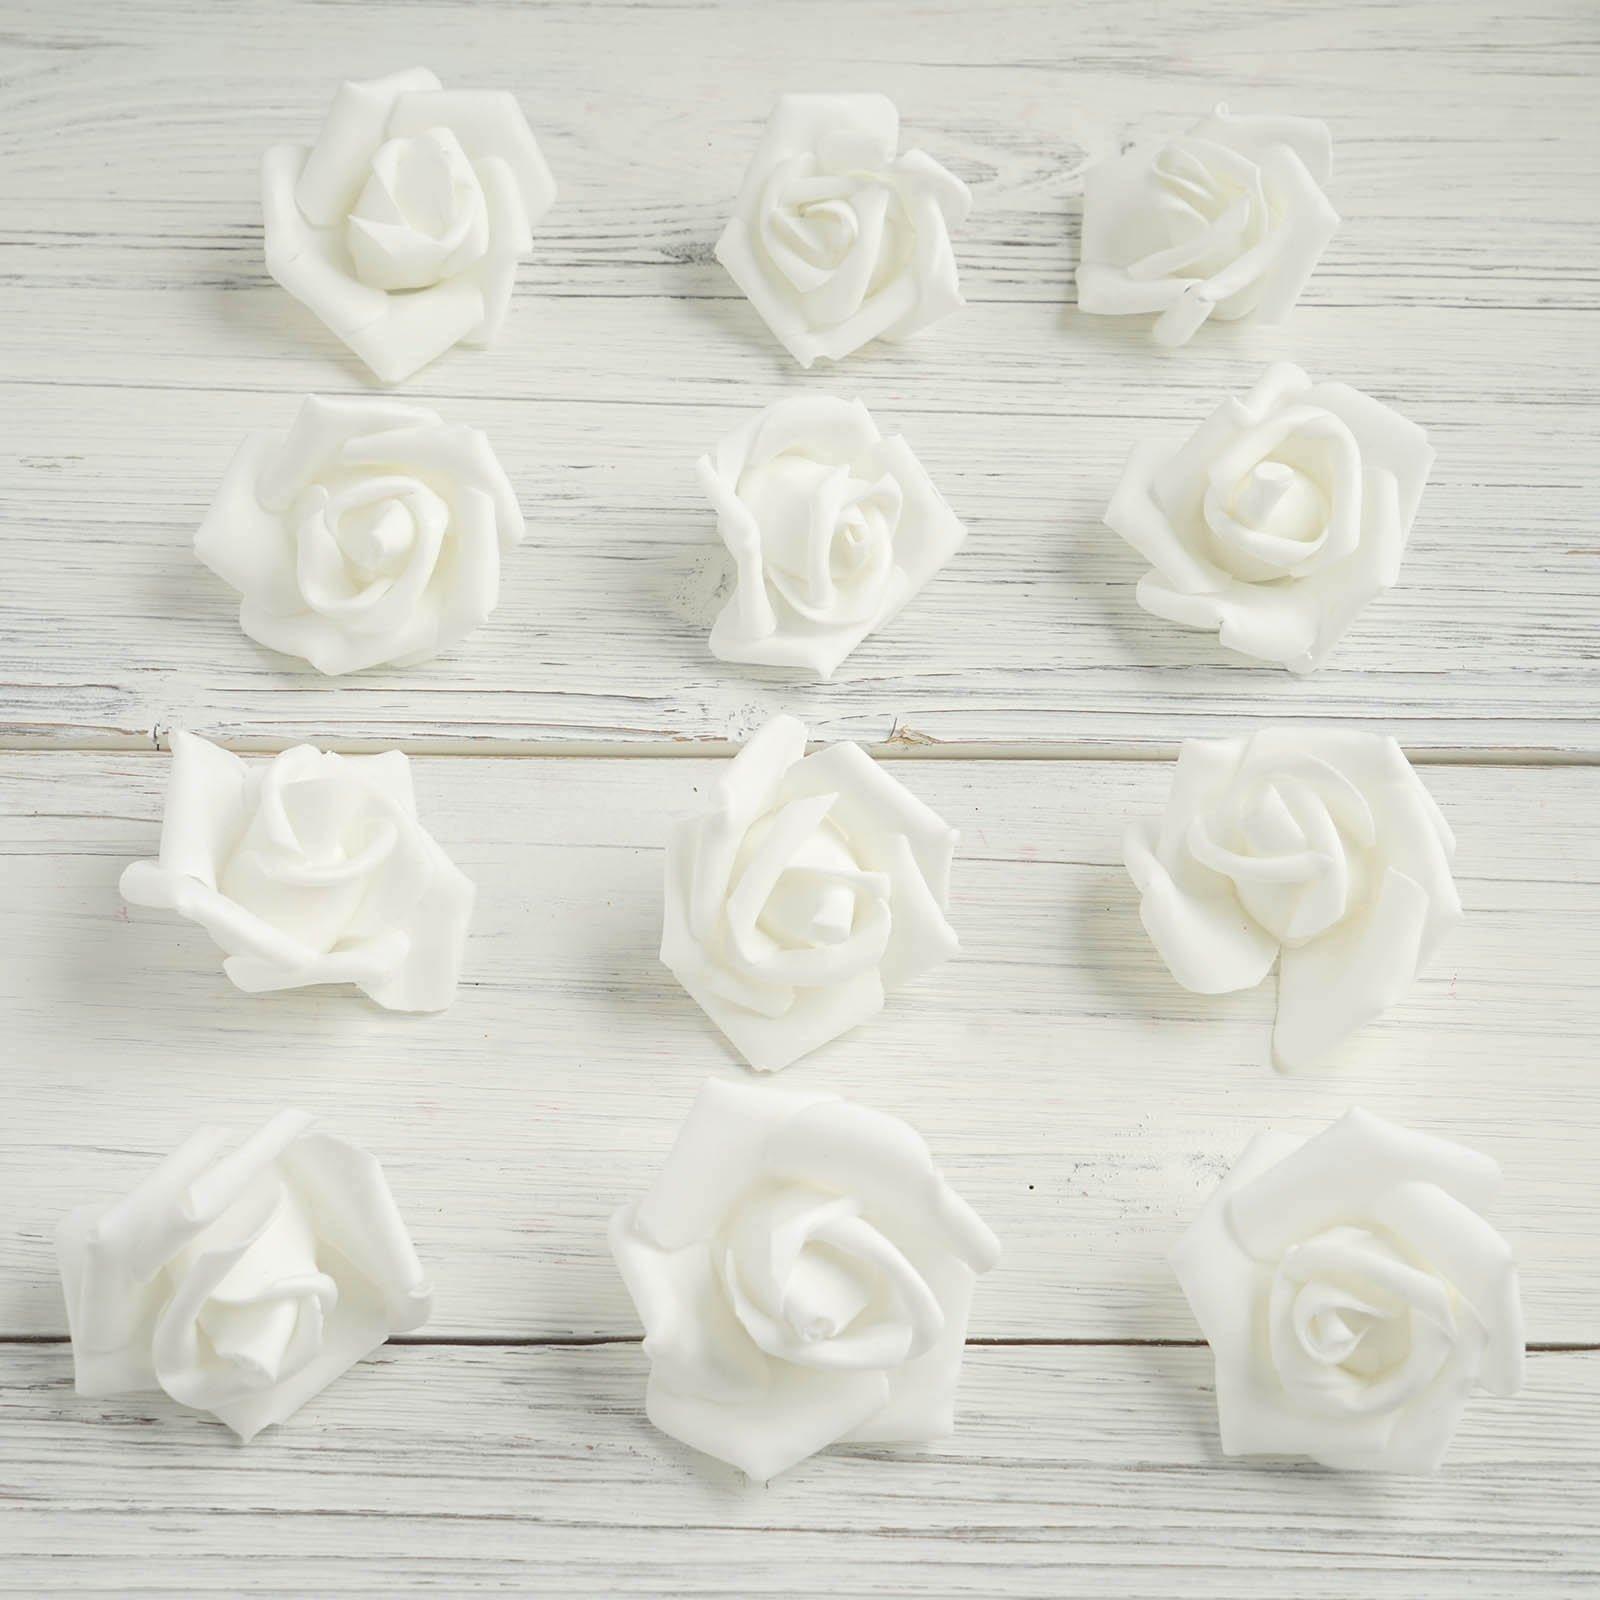 12 Pcs 2 White Real Touch 3d Artificial Diy Foam Rose Flower Head Foam Roses Faux Flowers Flower Arrangements